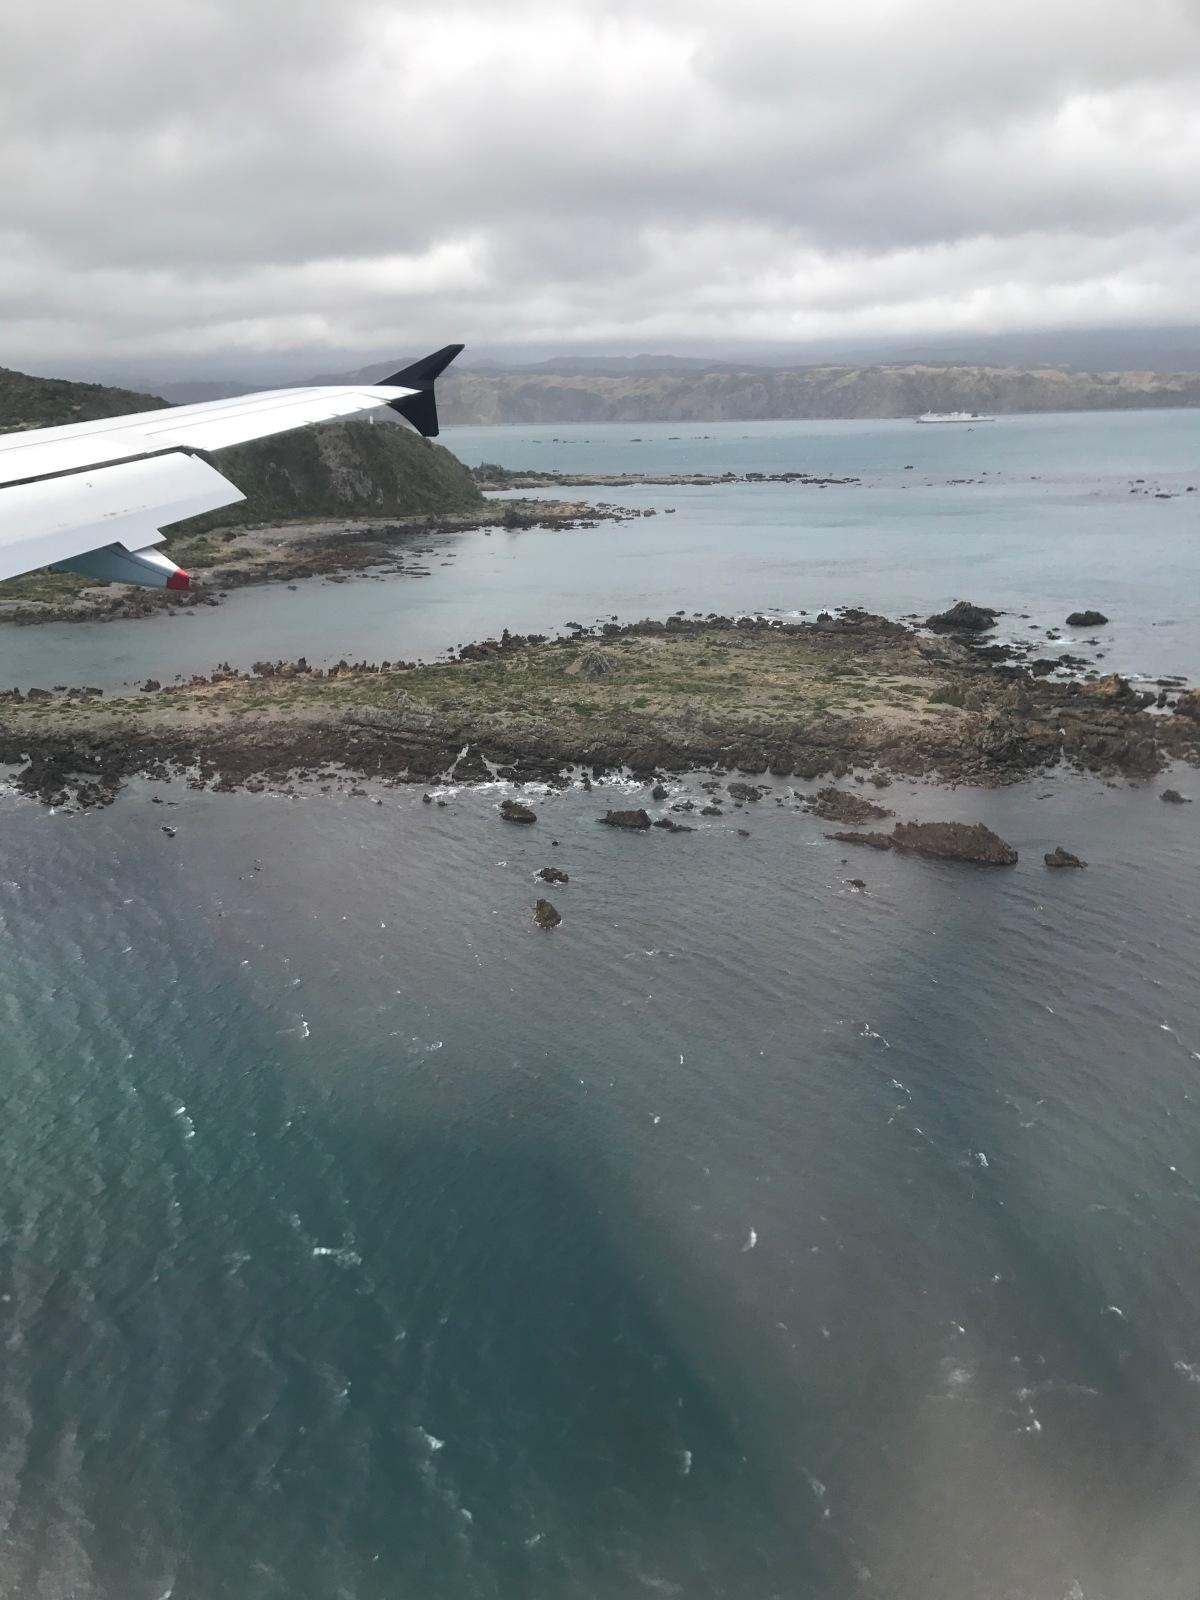 Arriving in NZ